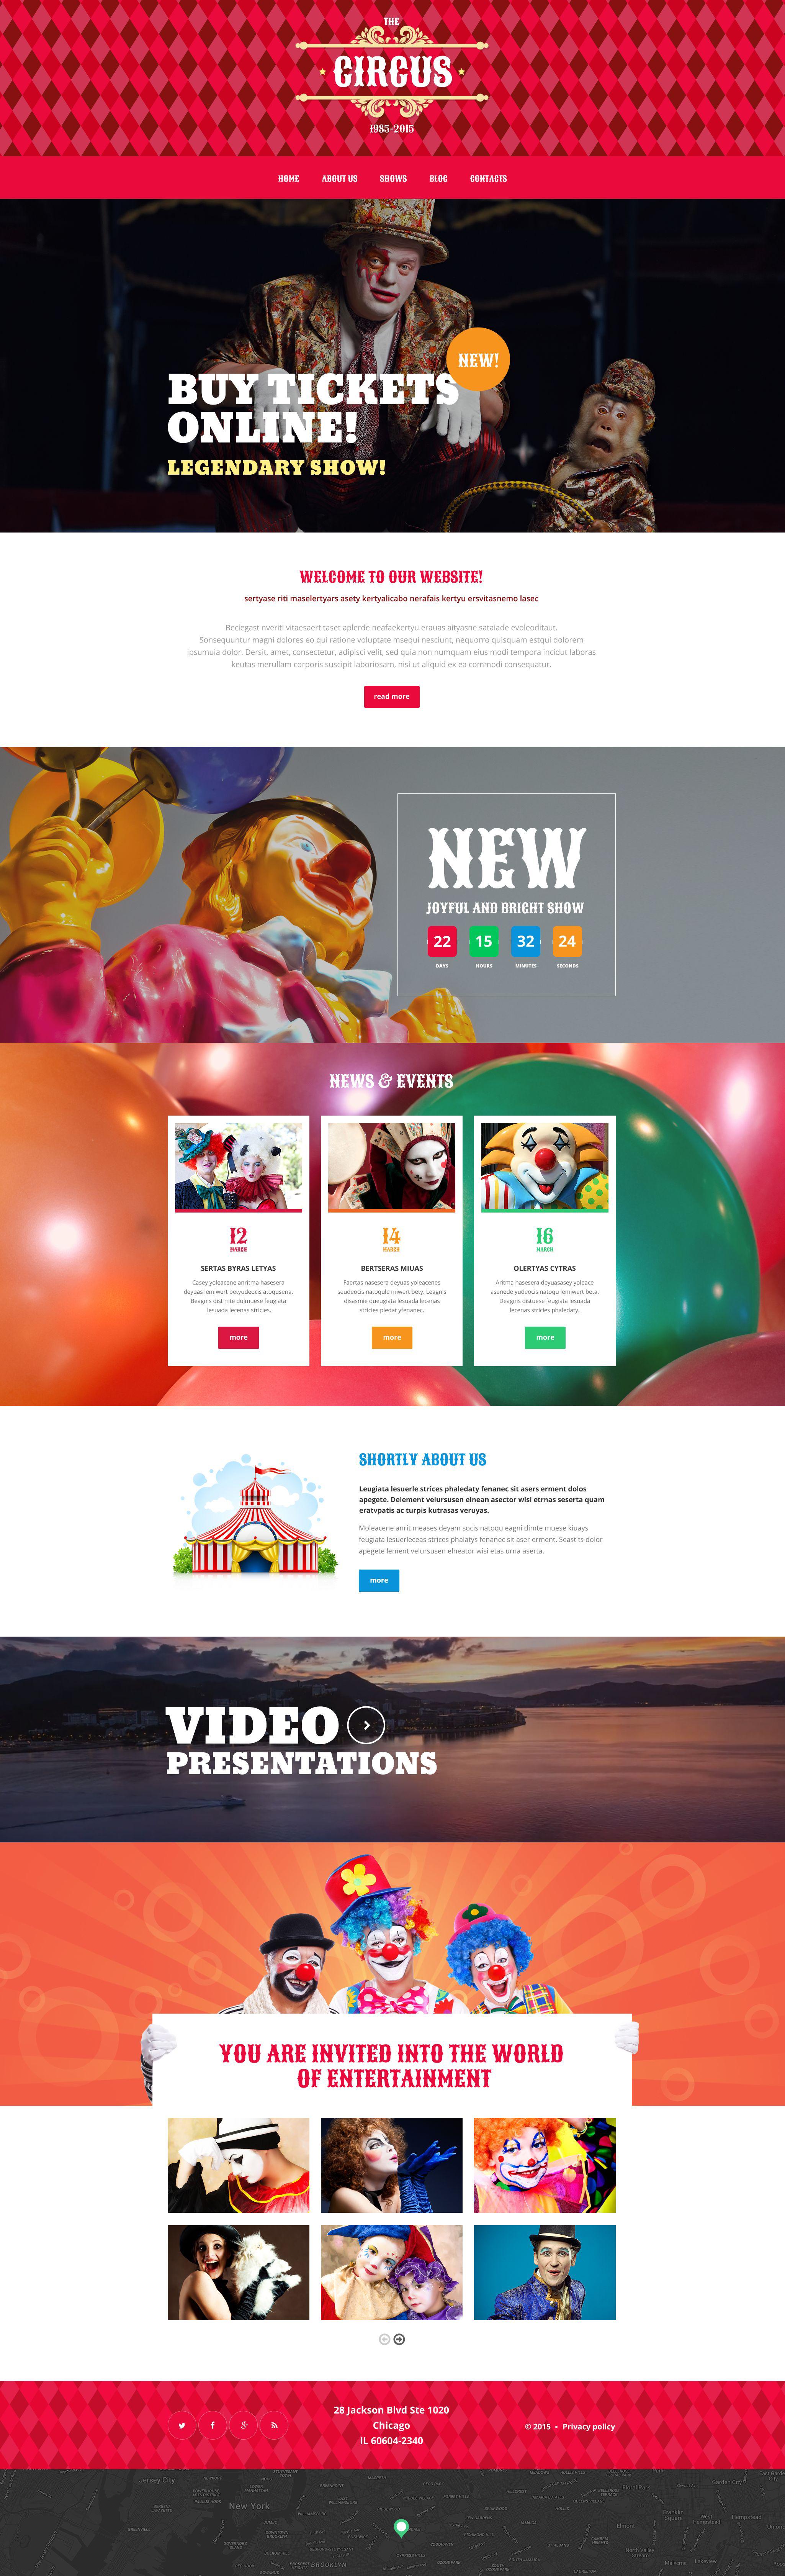 """Circus Tent"" - адаптивний WordPress шаблон №55589 - скріншот"